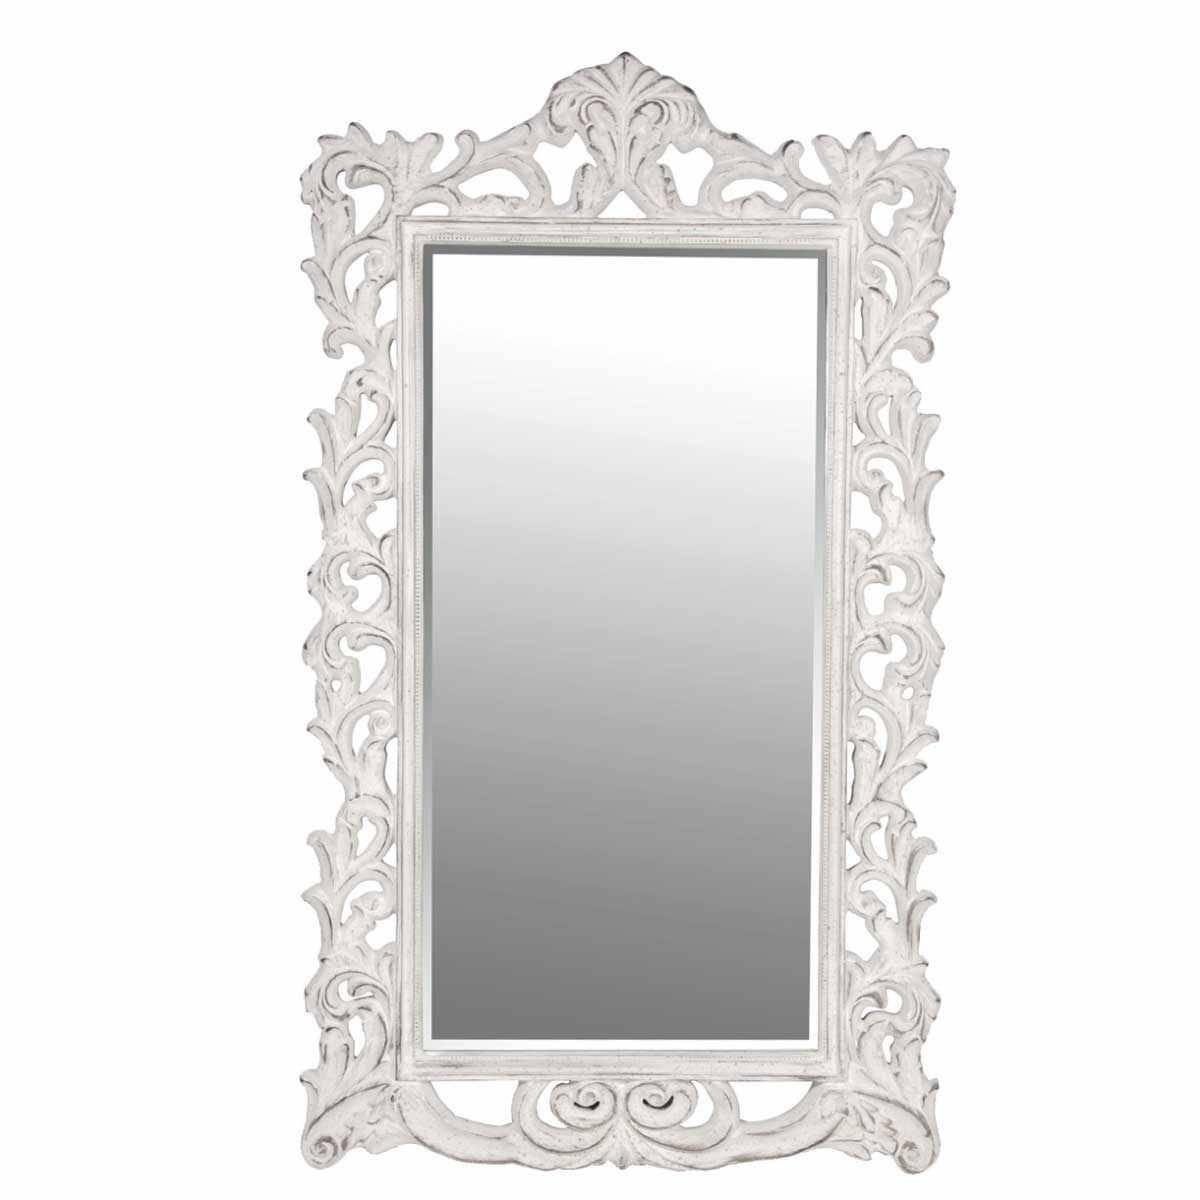 Homeware: Oval Full Length Standing Mirror | Large Floor Mirrors with Full Length French Mirrors (Image 23 of 25)